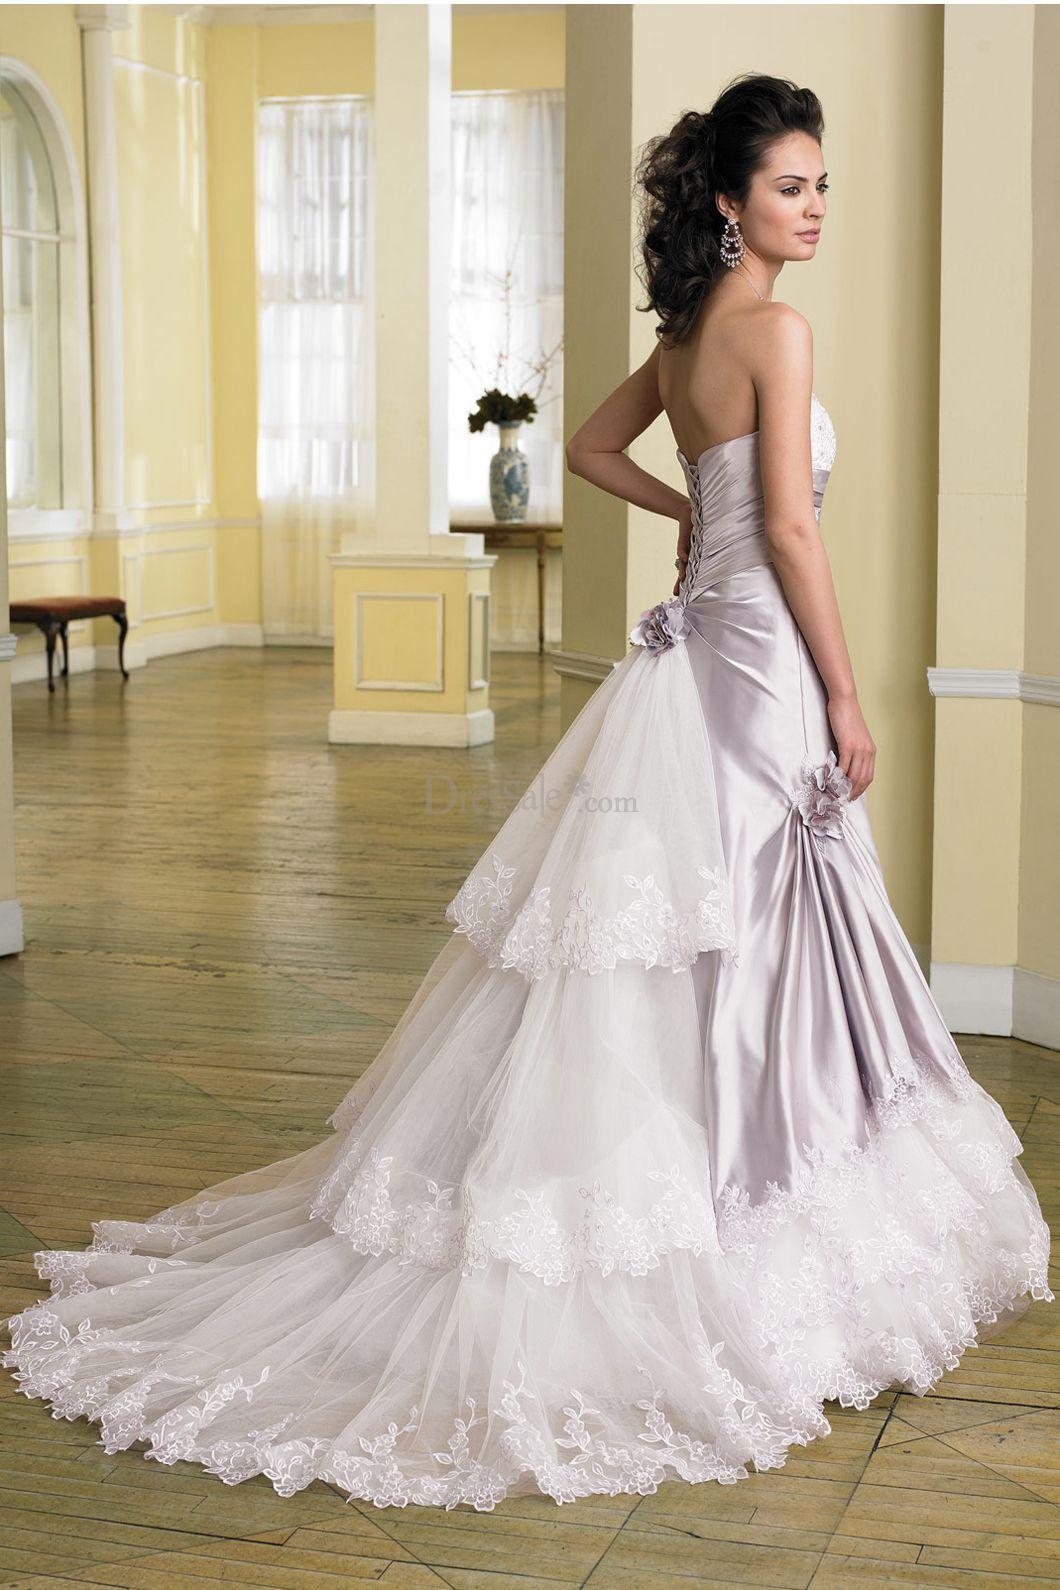 Fancy Light Purple Silk Wedding Dress with Glistening Detailed ...